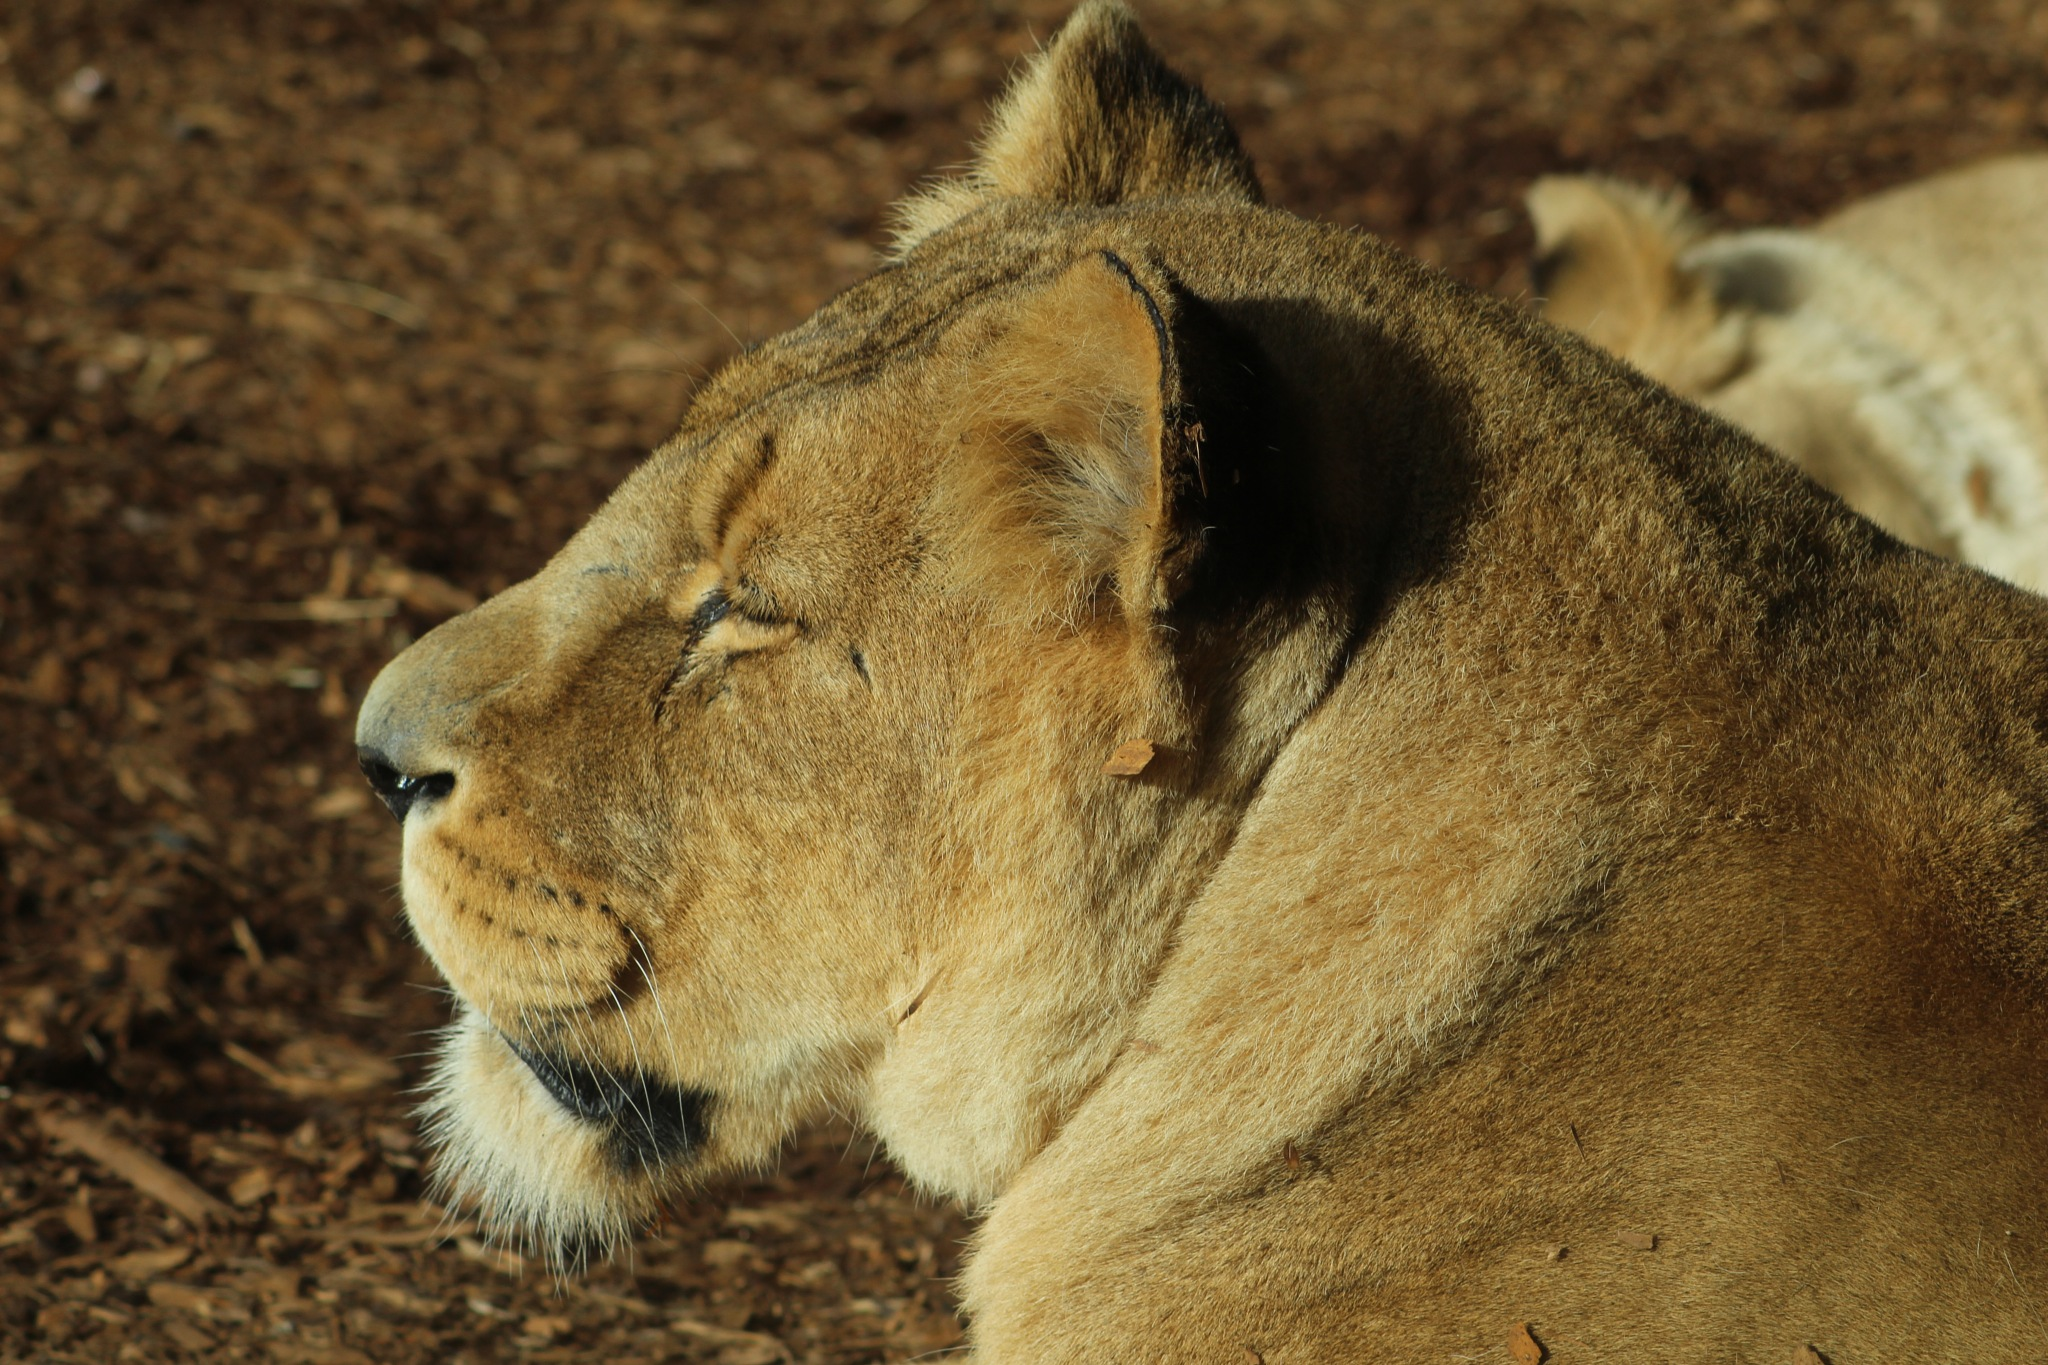 Let sleeping lions lie by RichardWynne